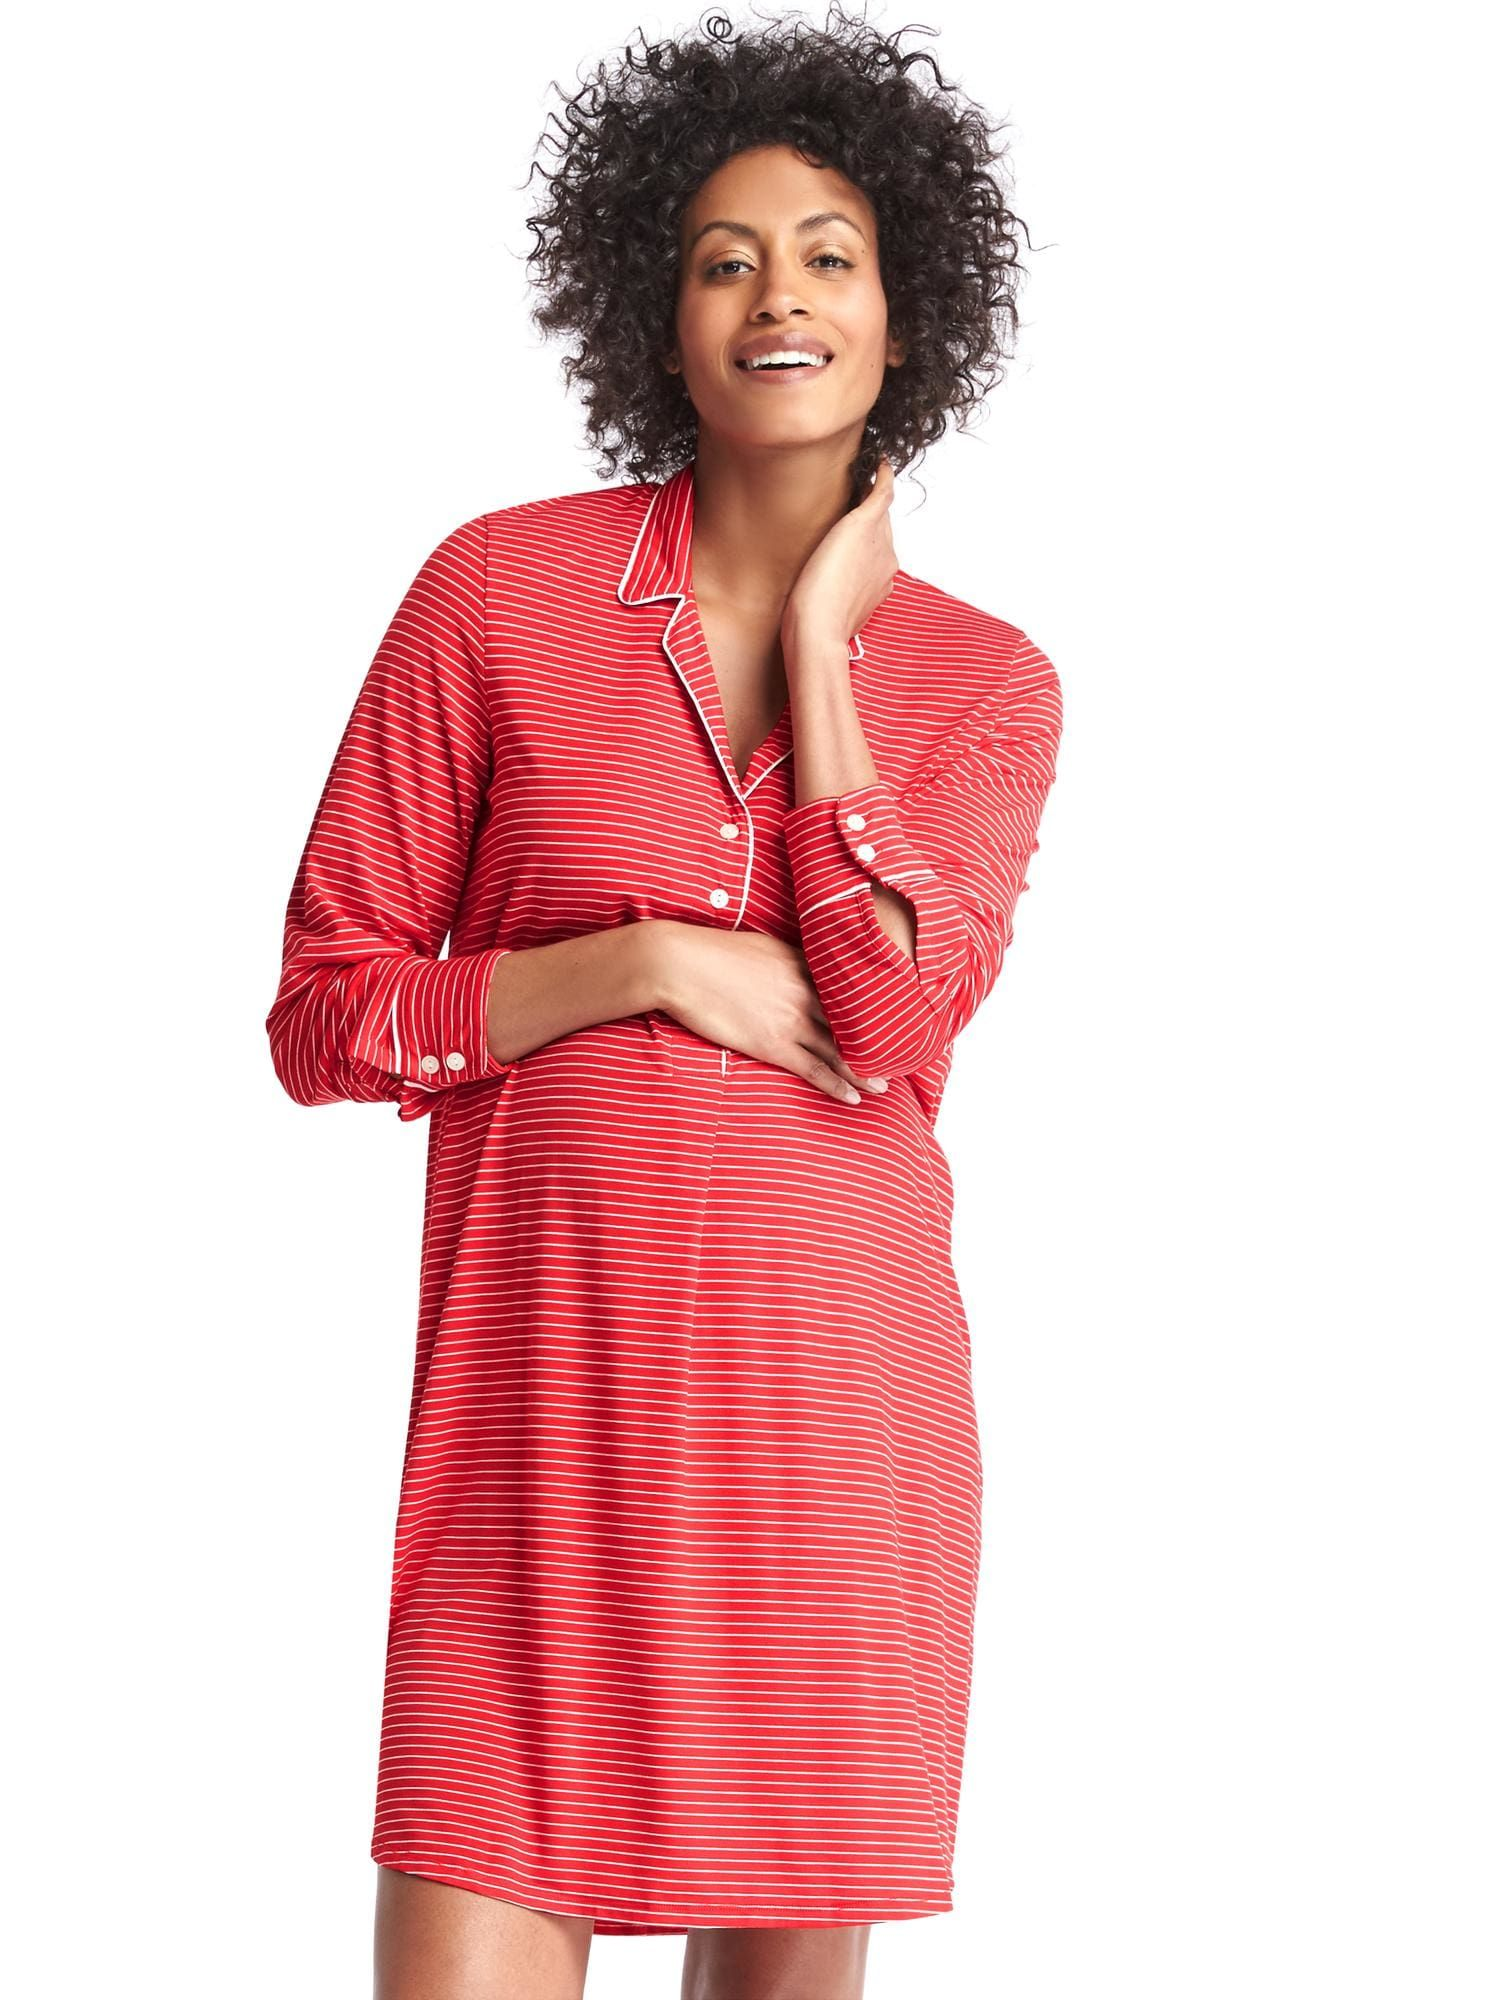 823ae95ef5cb6 SAMI - Print sleep shirtdress | Gap - RED SIZE SMALL | sami and ...